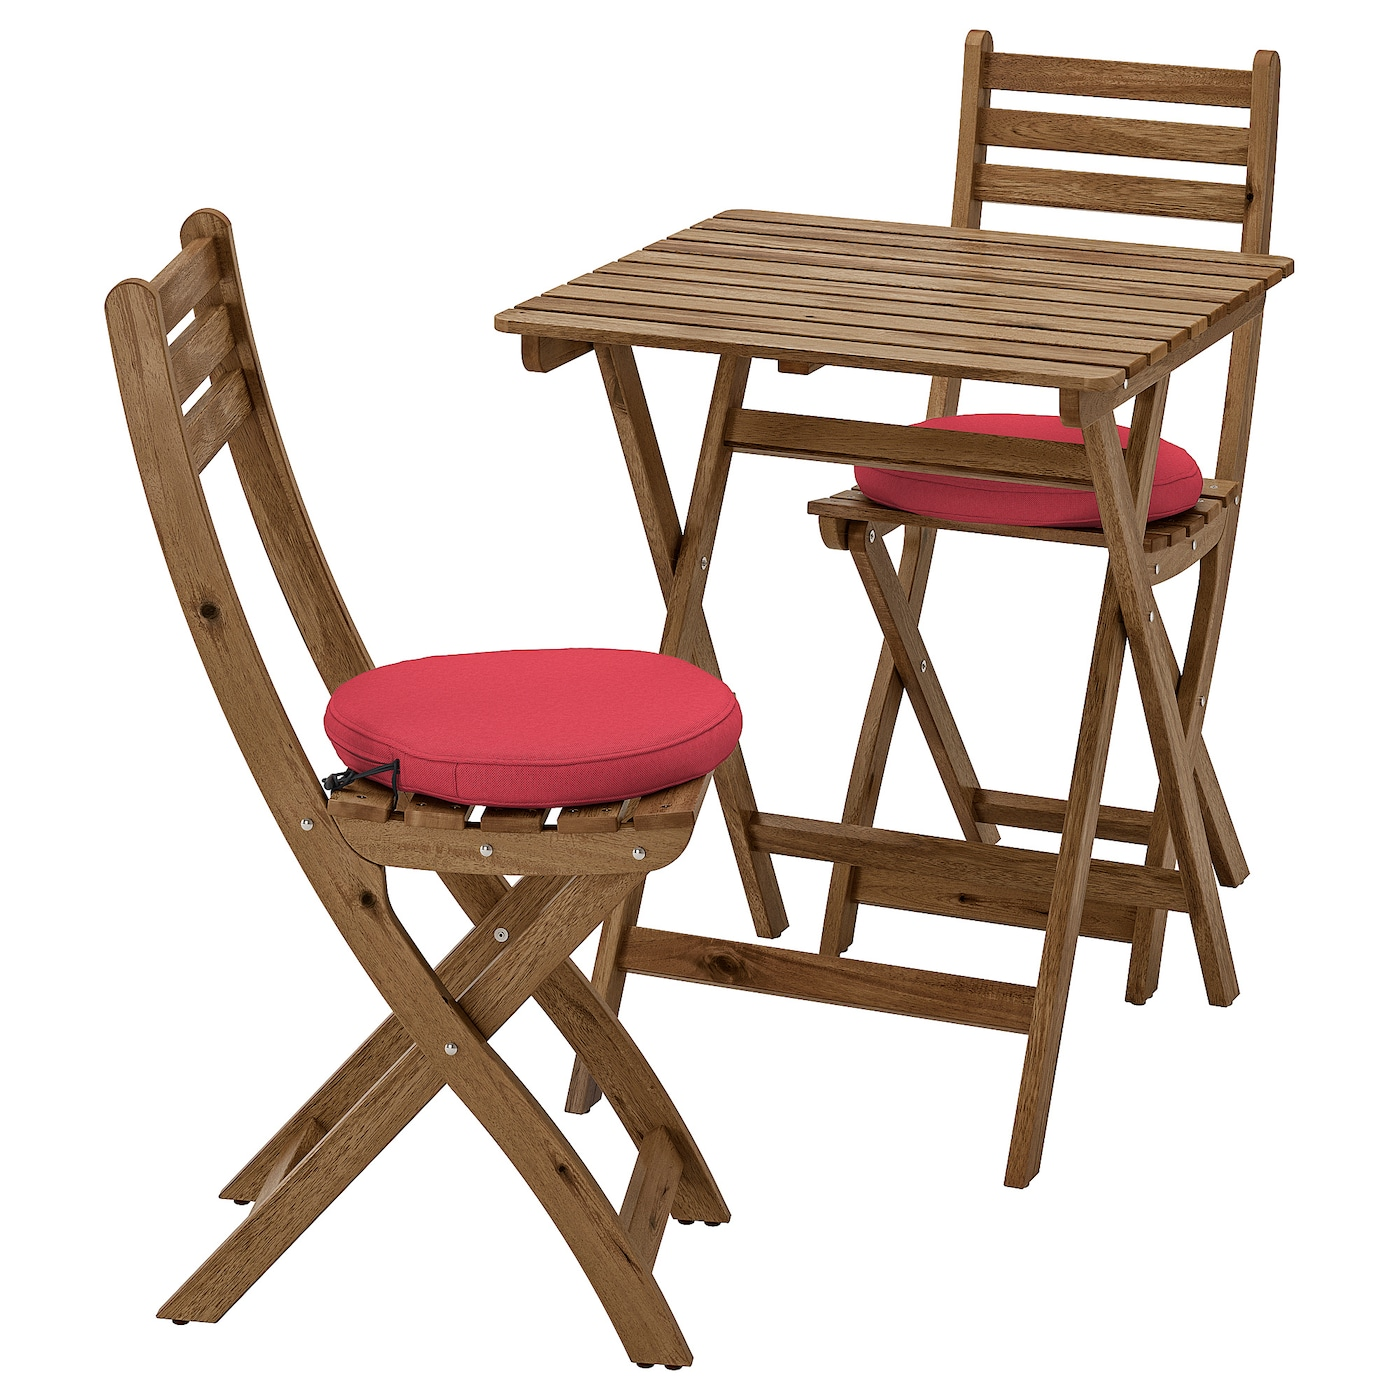 PliantesExtérieurTeinté Rouge Table2 Chaises Gris Askholmen BrunFrösönduvholmen nw8OvmN0